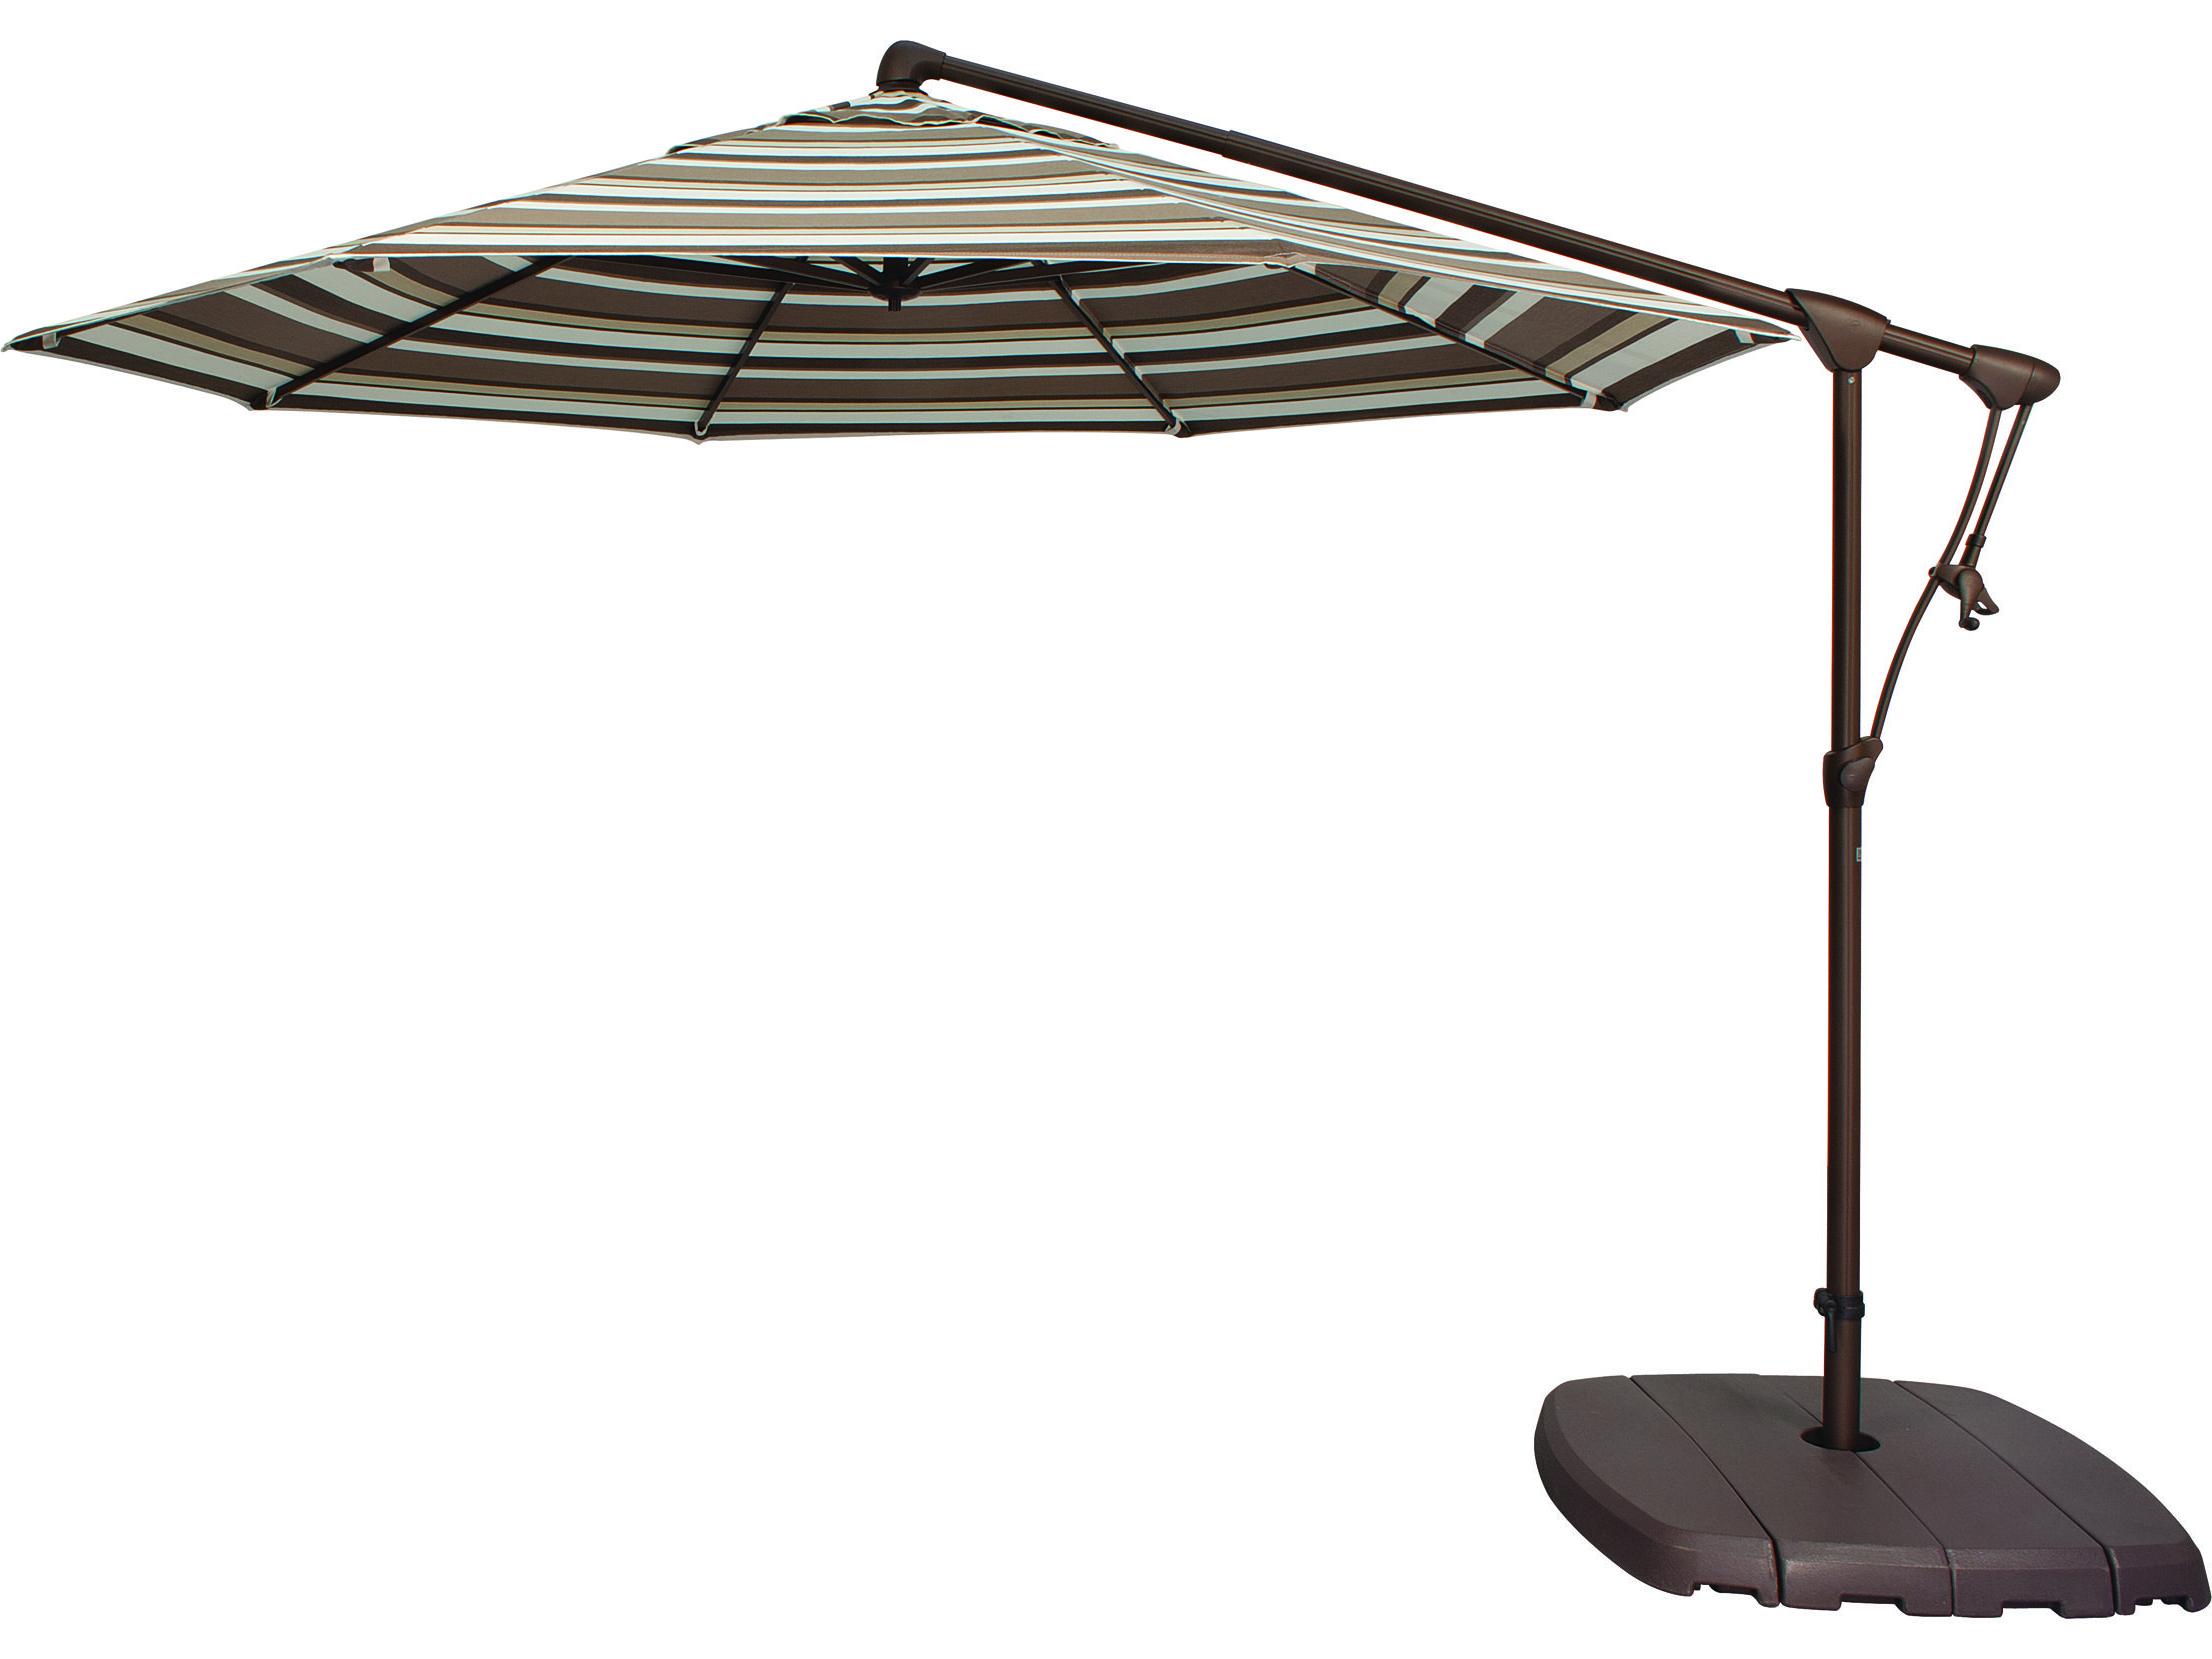 Most Recent Treasure Garden Cantilever Ag19 Aluminum 10' Octagon Tilt & Lock Pertaining To Carlisle Cantilever Sunbrella Umbrellas (Gallery 9 of 20)